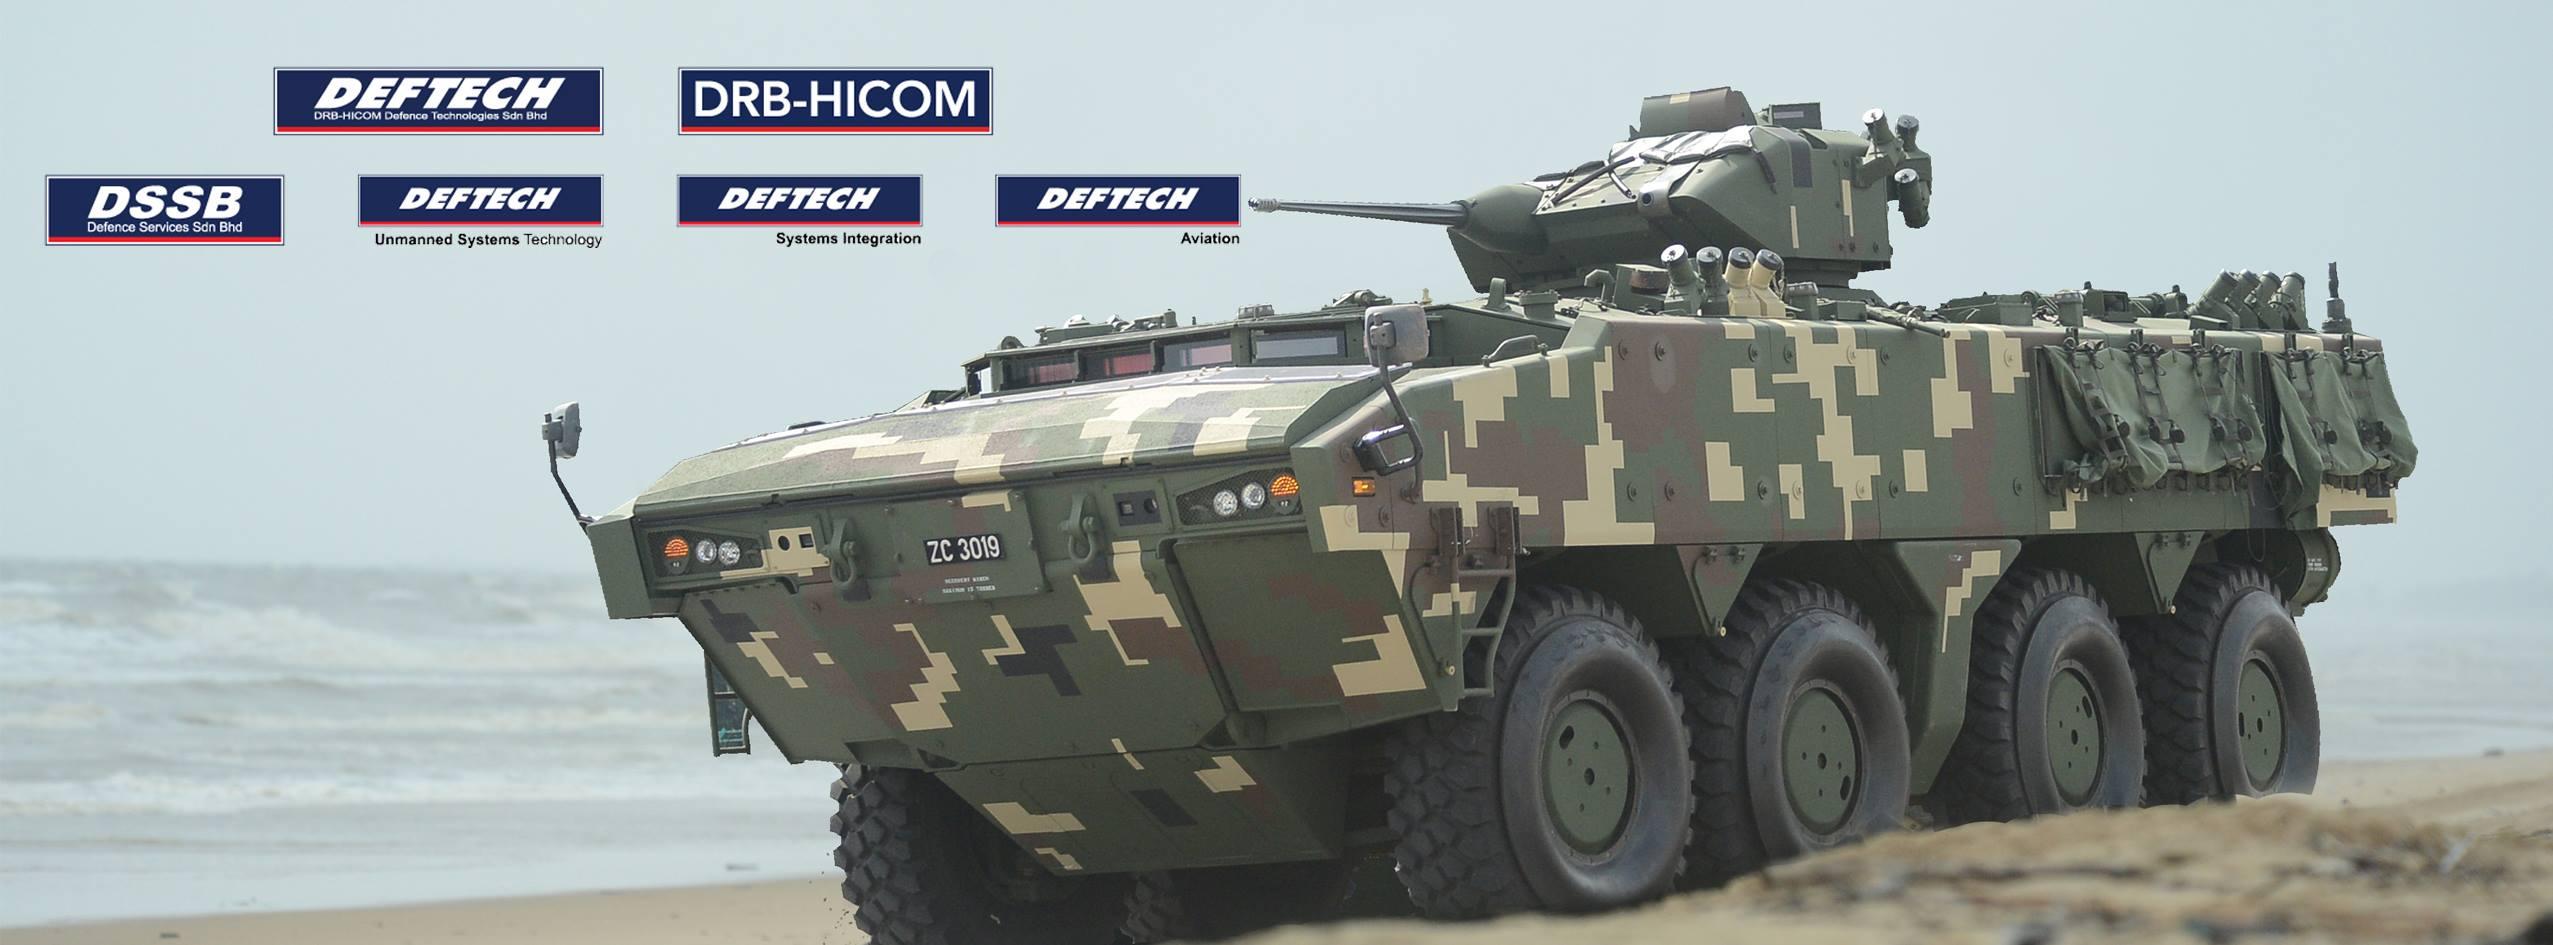 DEFTECH - DRB-HICOM Defence Technologies Sdn. Bhd